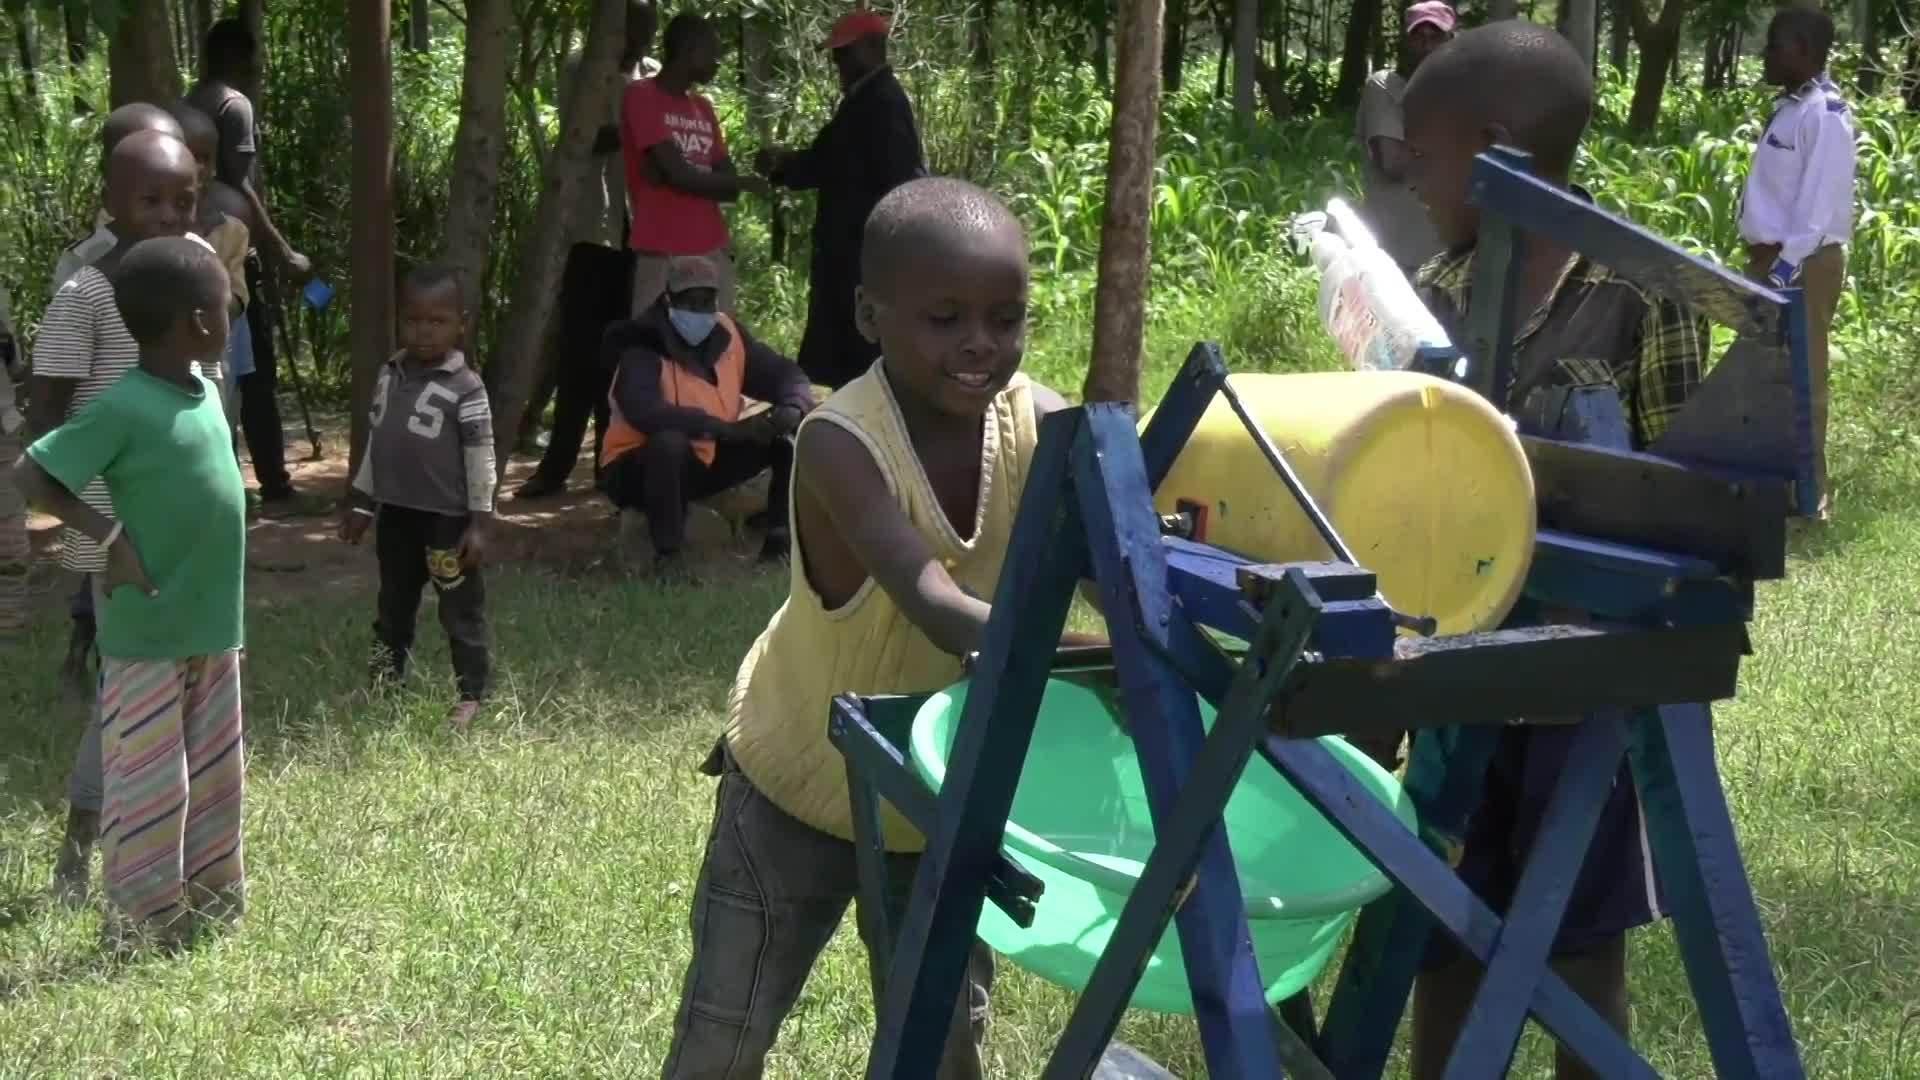 macchina per lavarsi le mani in Kenia